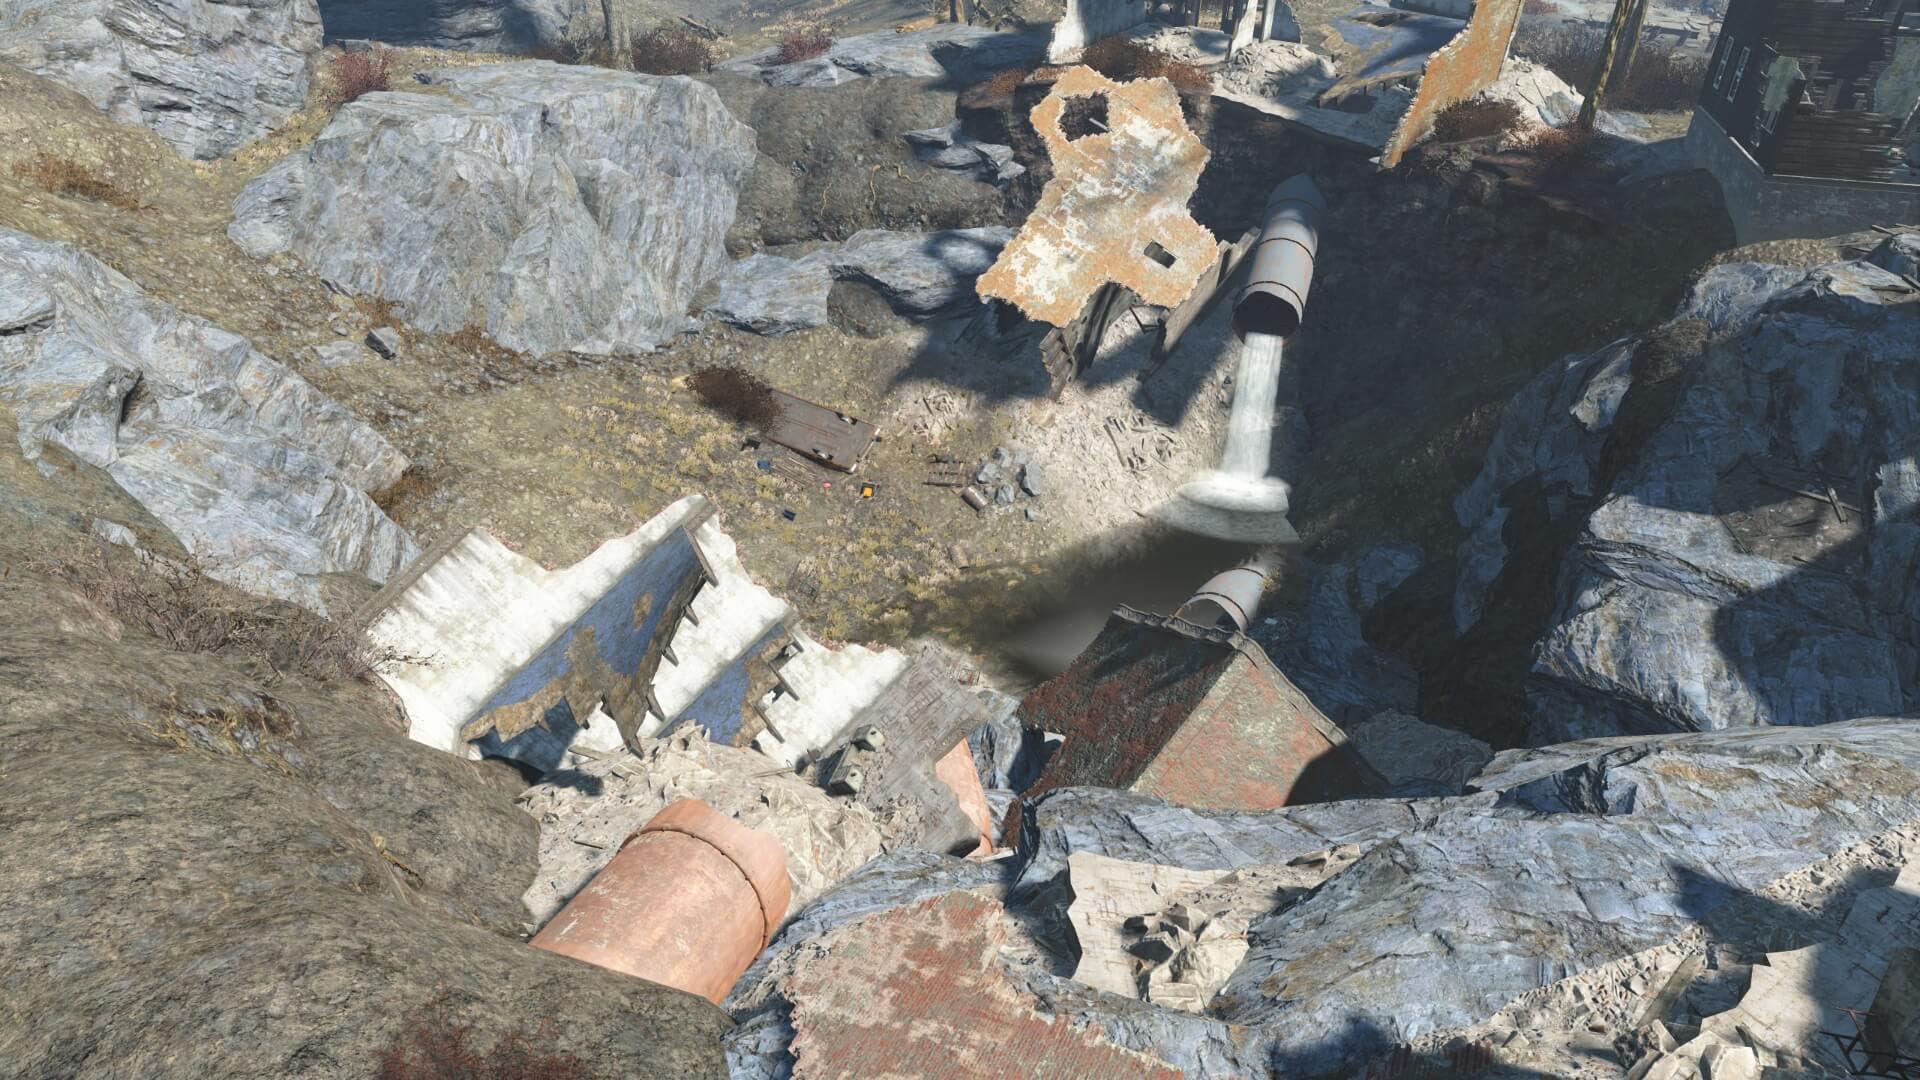 Old Gullet Sinkhole - Fallout 4 secrets